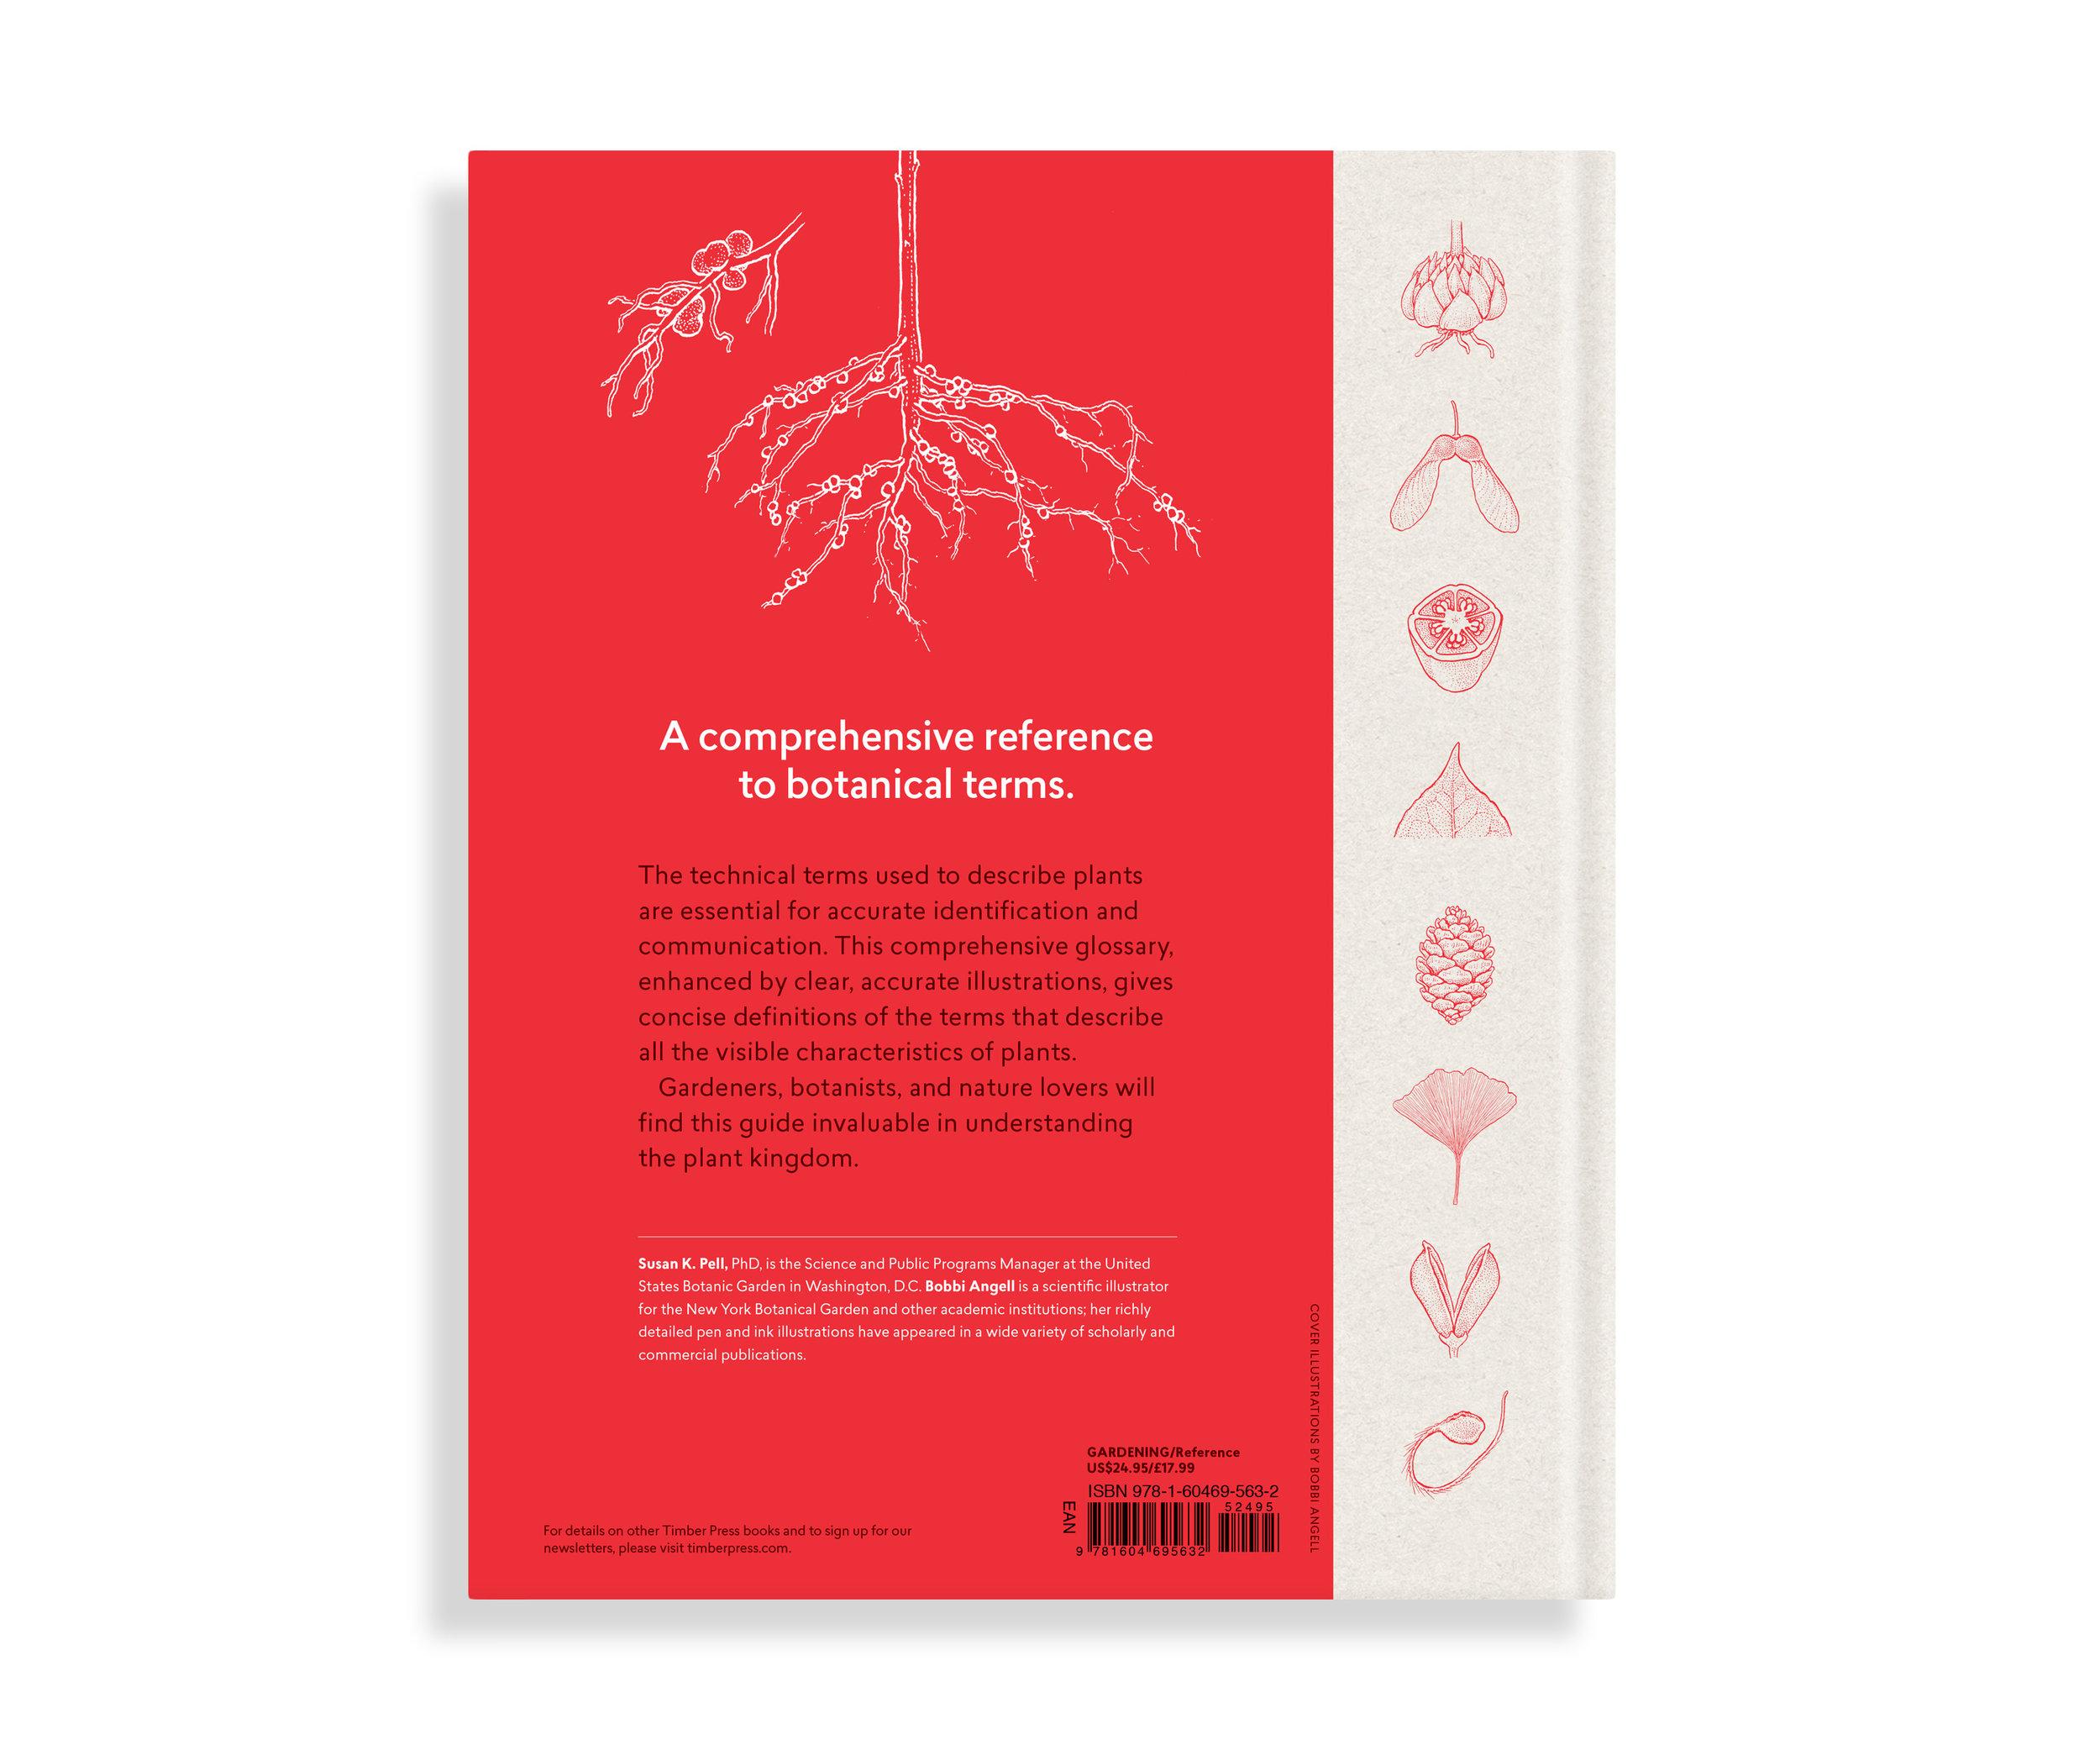 book_botanistsvocabulary_cover_003.jpg